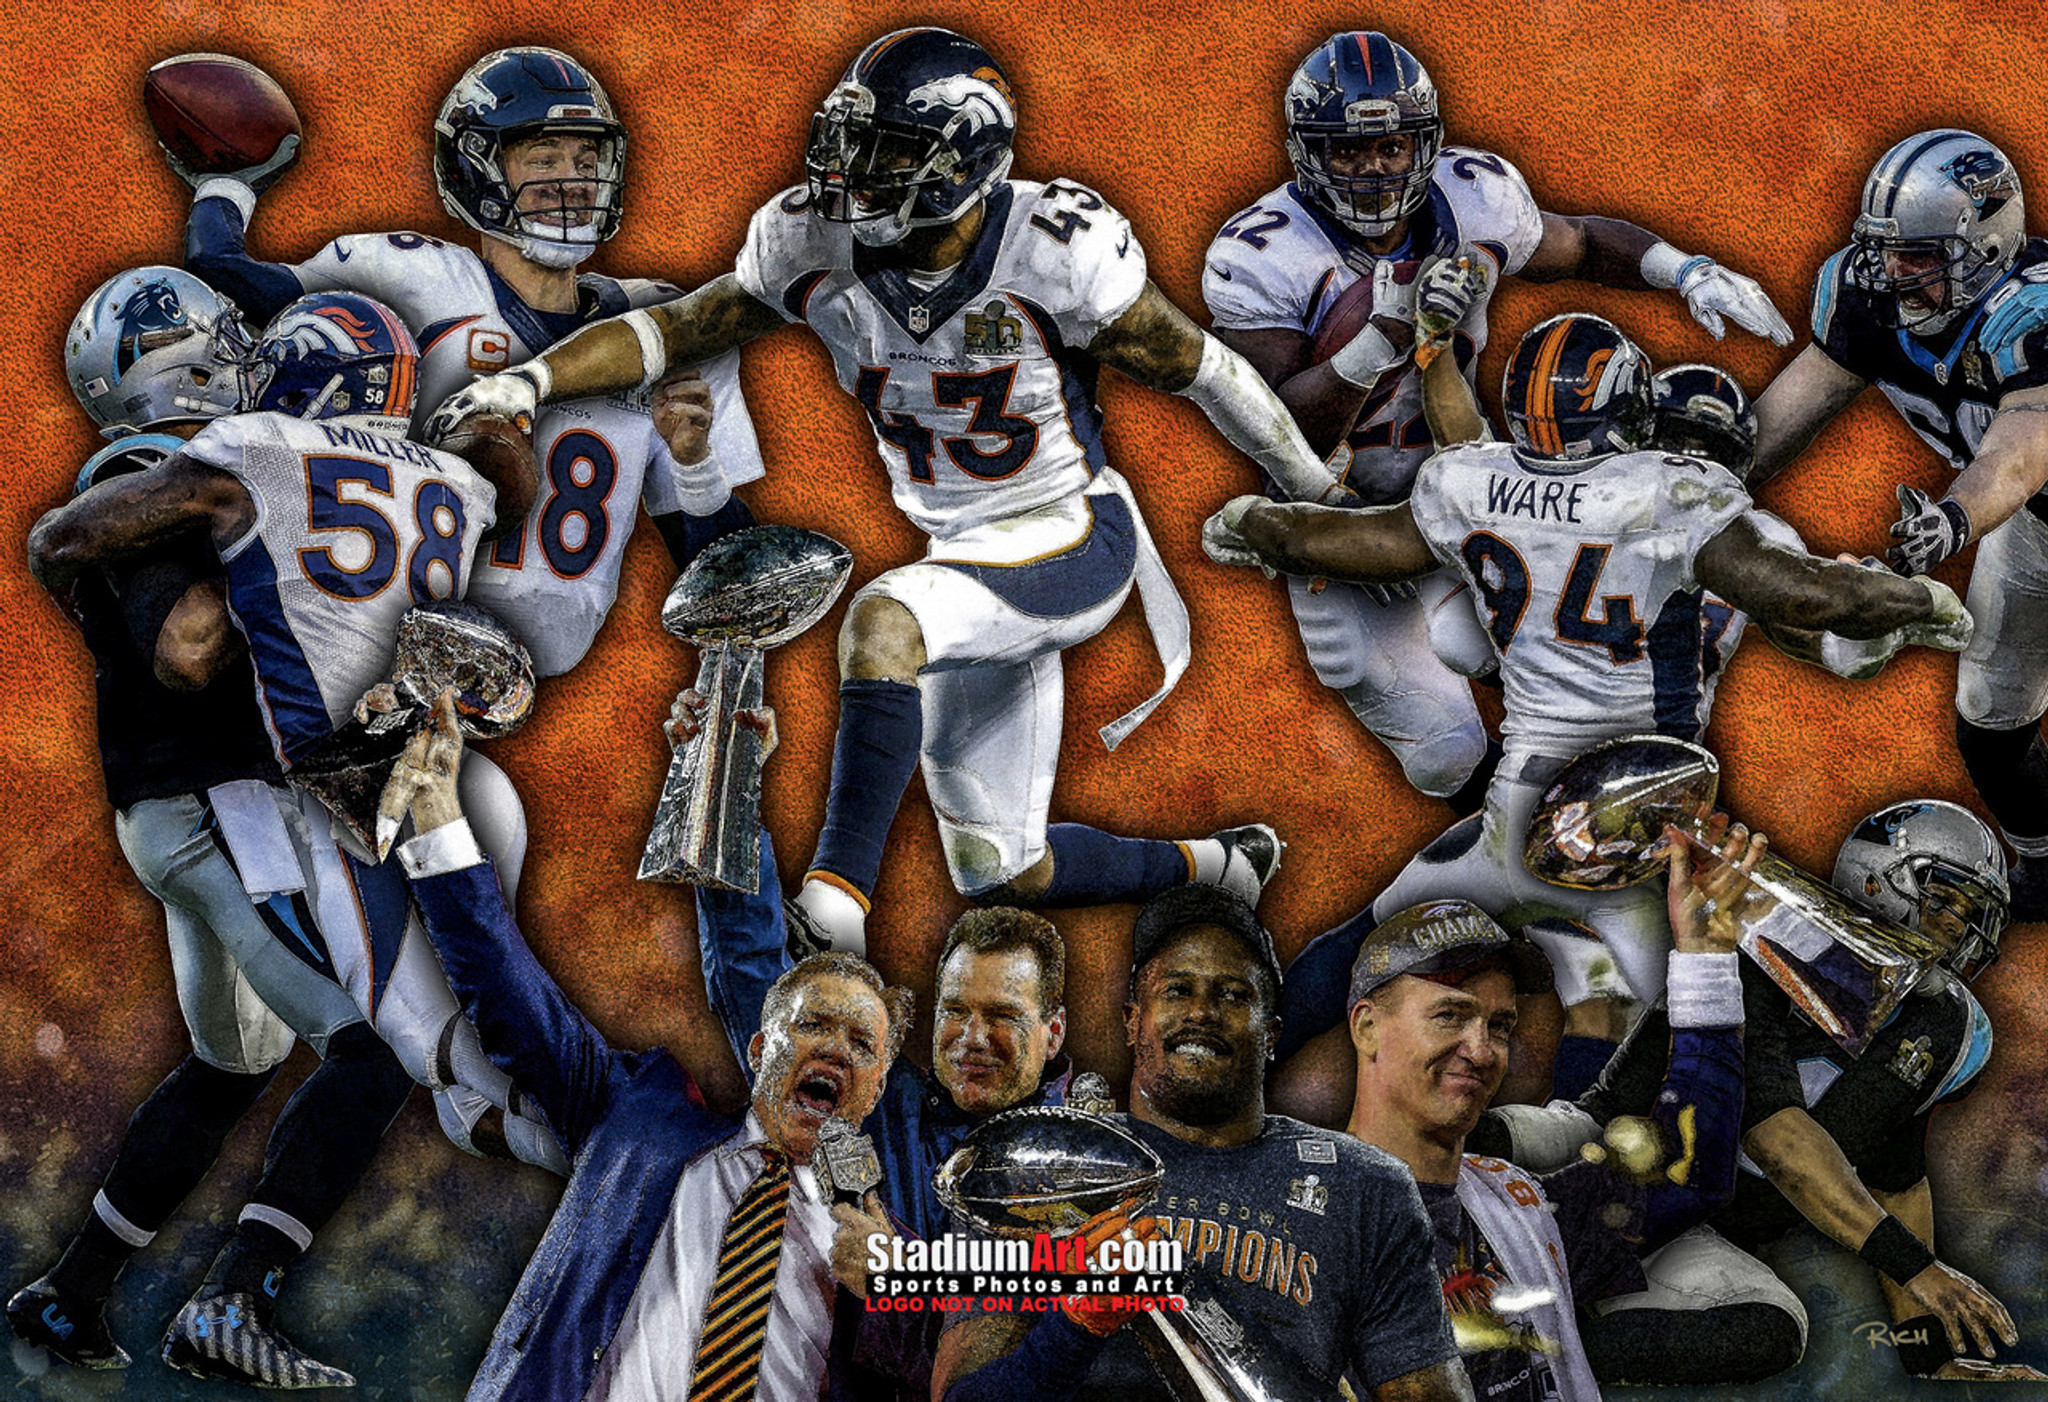 e19ce2d5 Denver Broncos Peyton Manning Super Bowl 50 Champions NFL Football Art  8x10-48x36